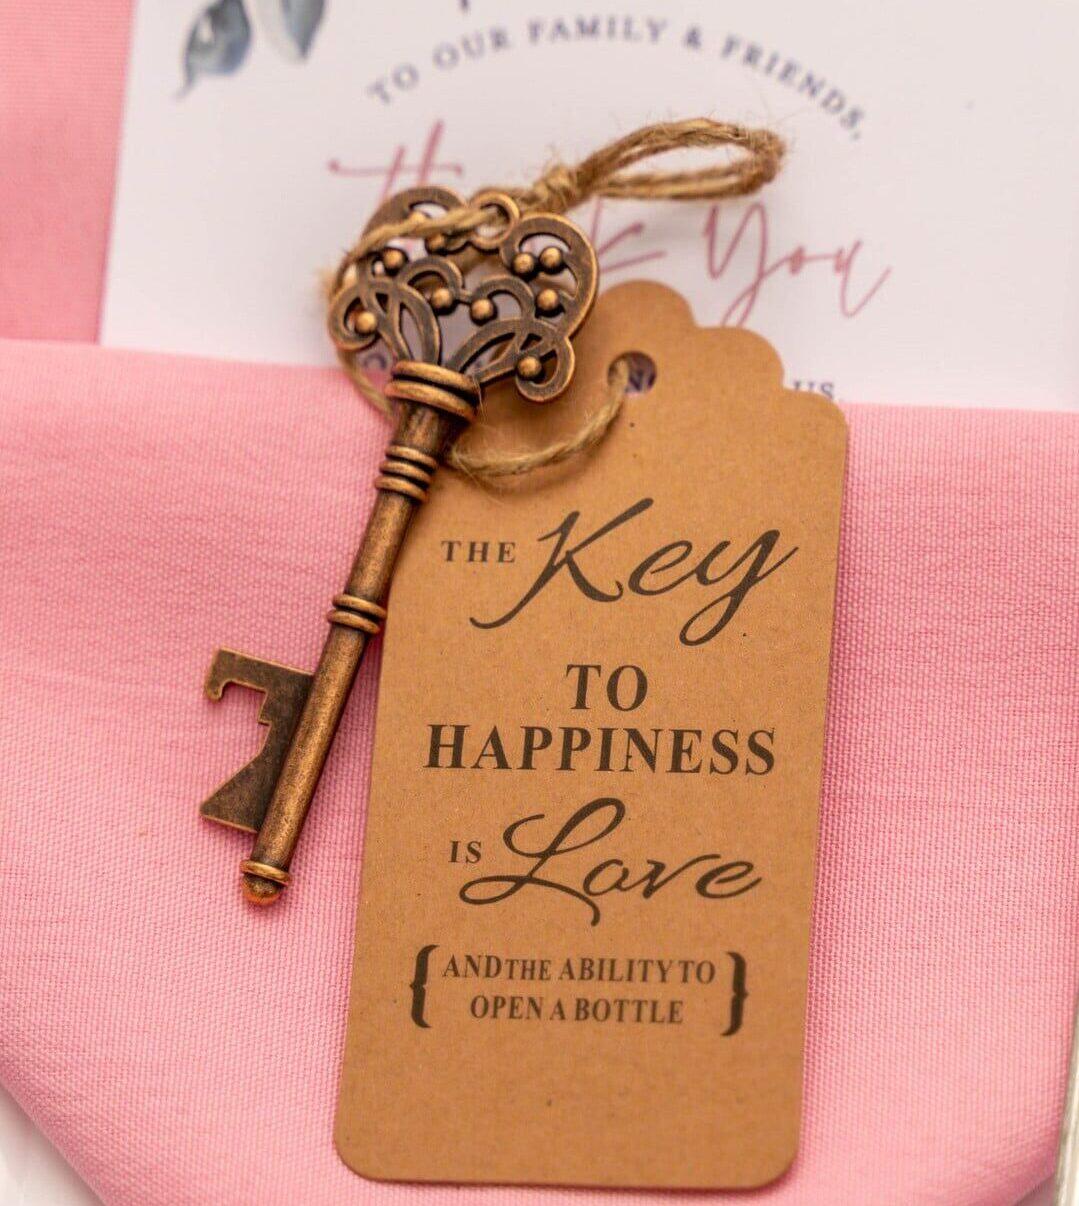 The Gift of LIfe - Angela & Gary's Inspiring Love Story 31